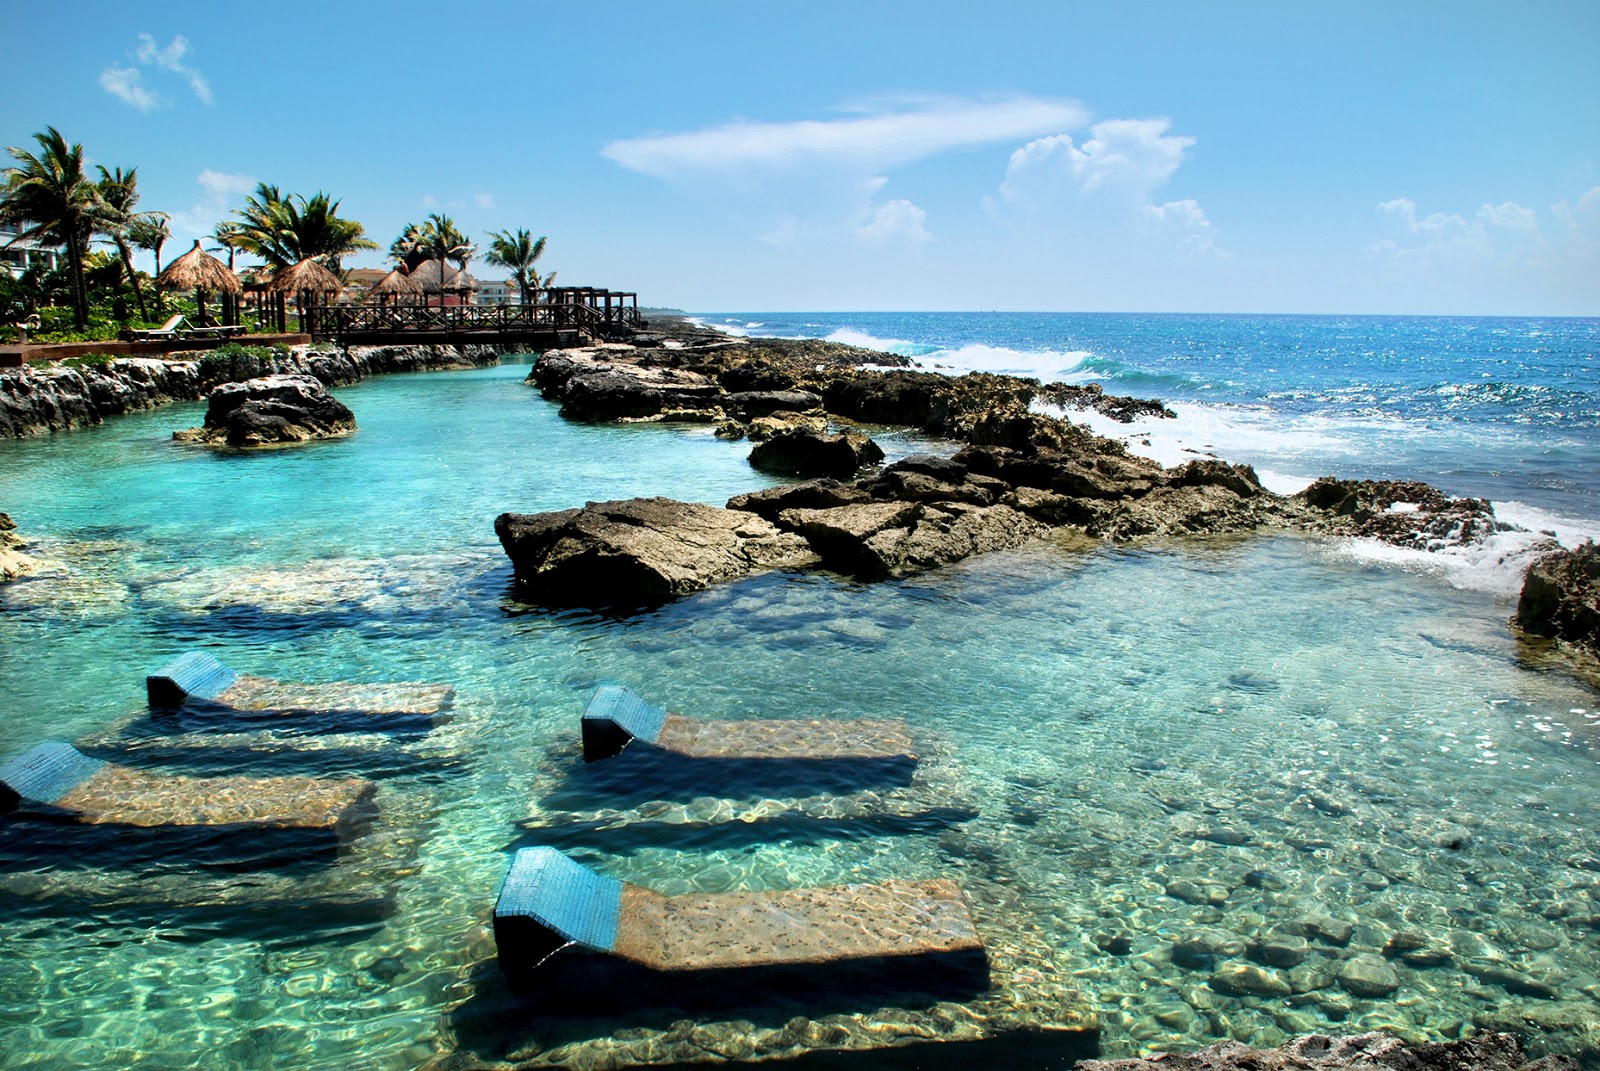 riviera maya turismo vacacional. Black Bedroom Furniture Sets. Home Design Ideas